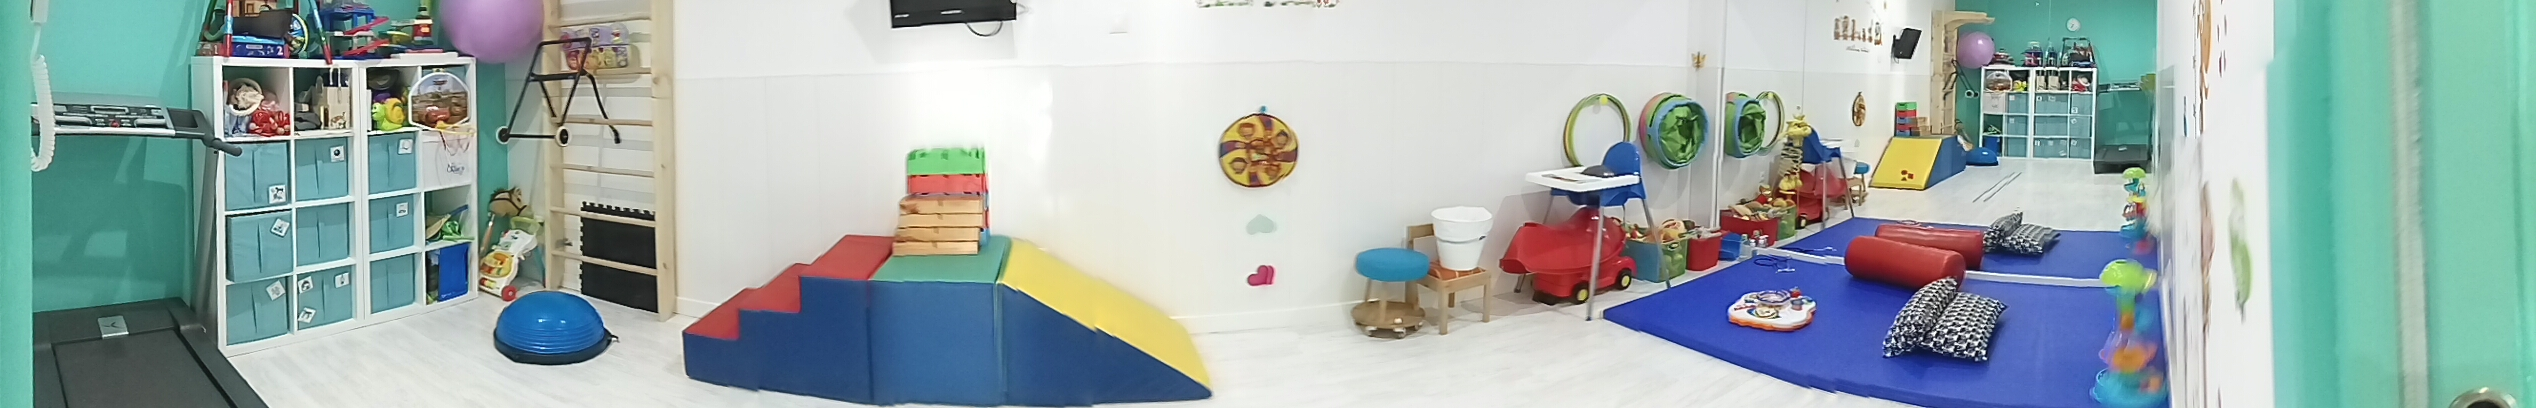 Sala pediatrica_panoramica_1